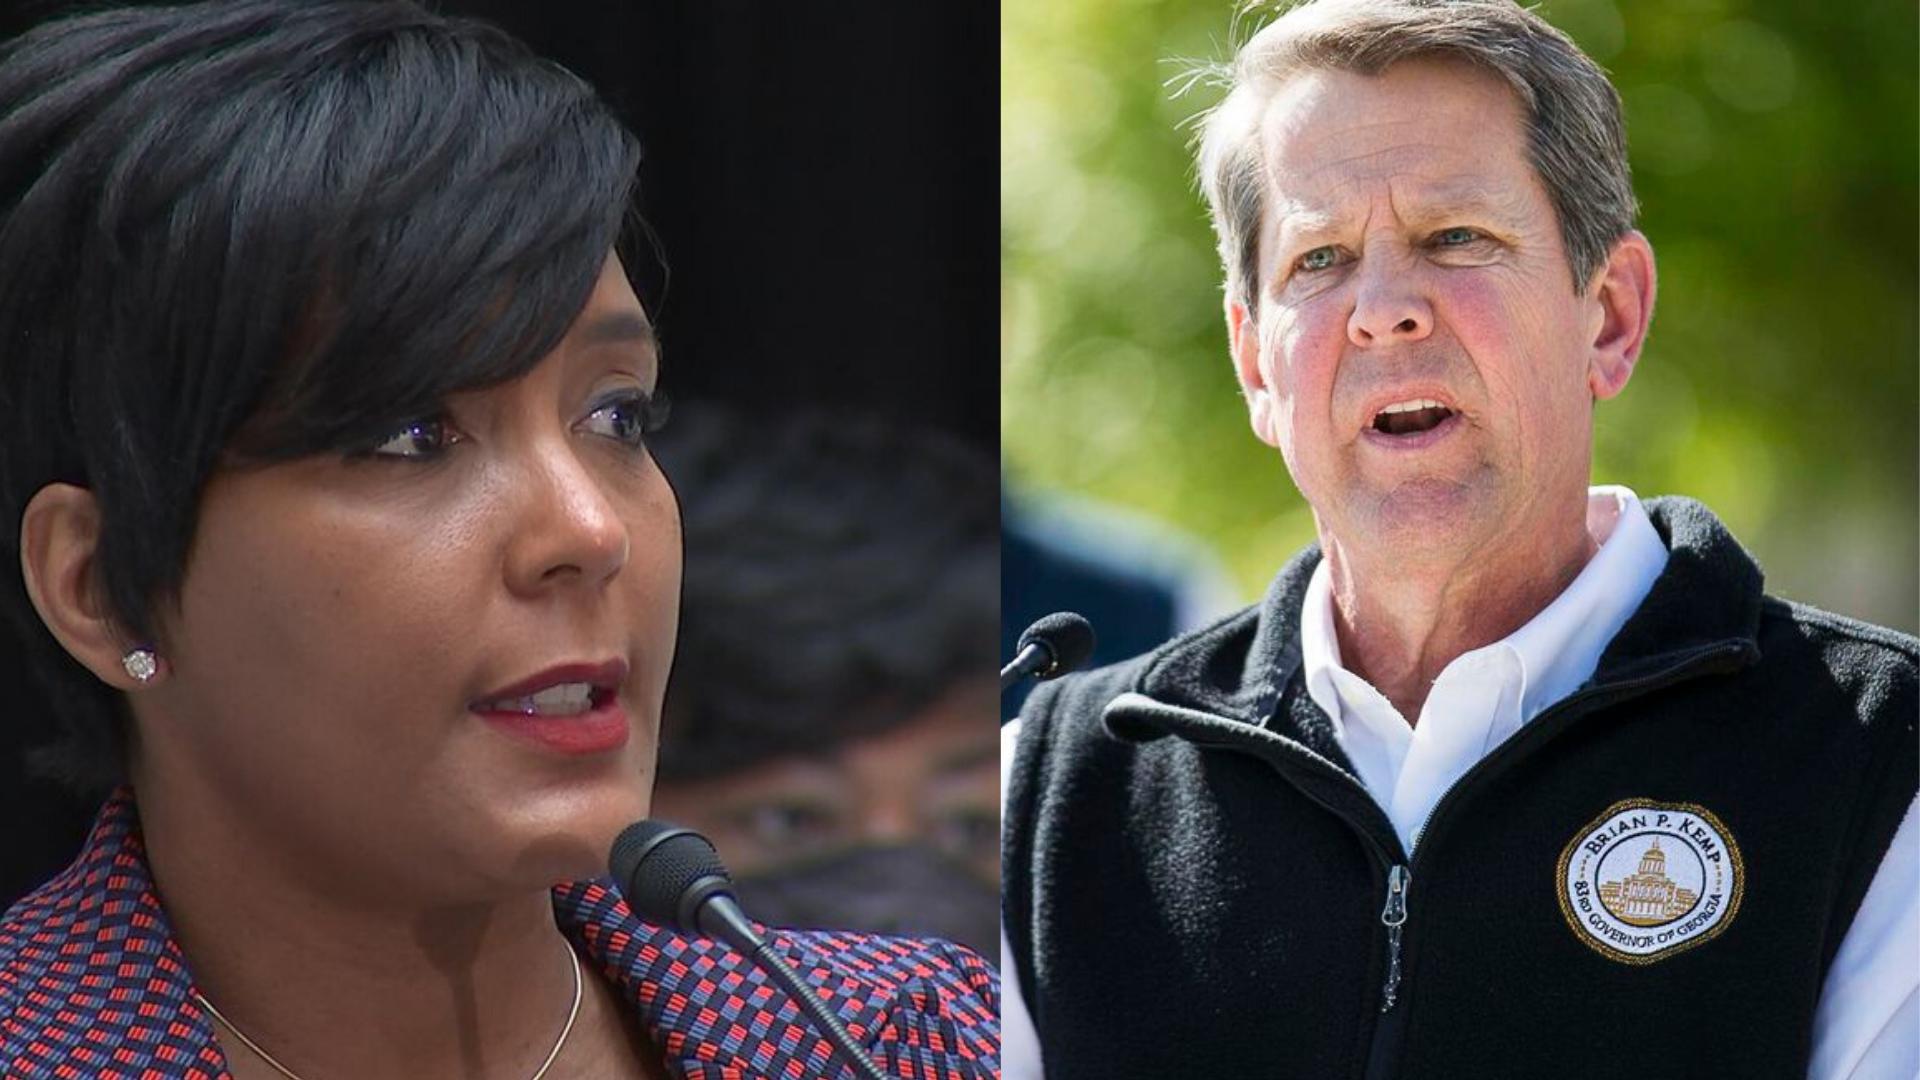 Mayor rolls back Atlanta's reopening plan from Phase 2 to Phase 1